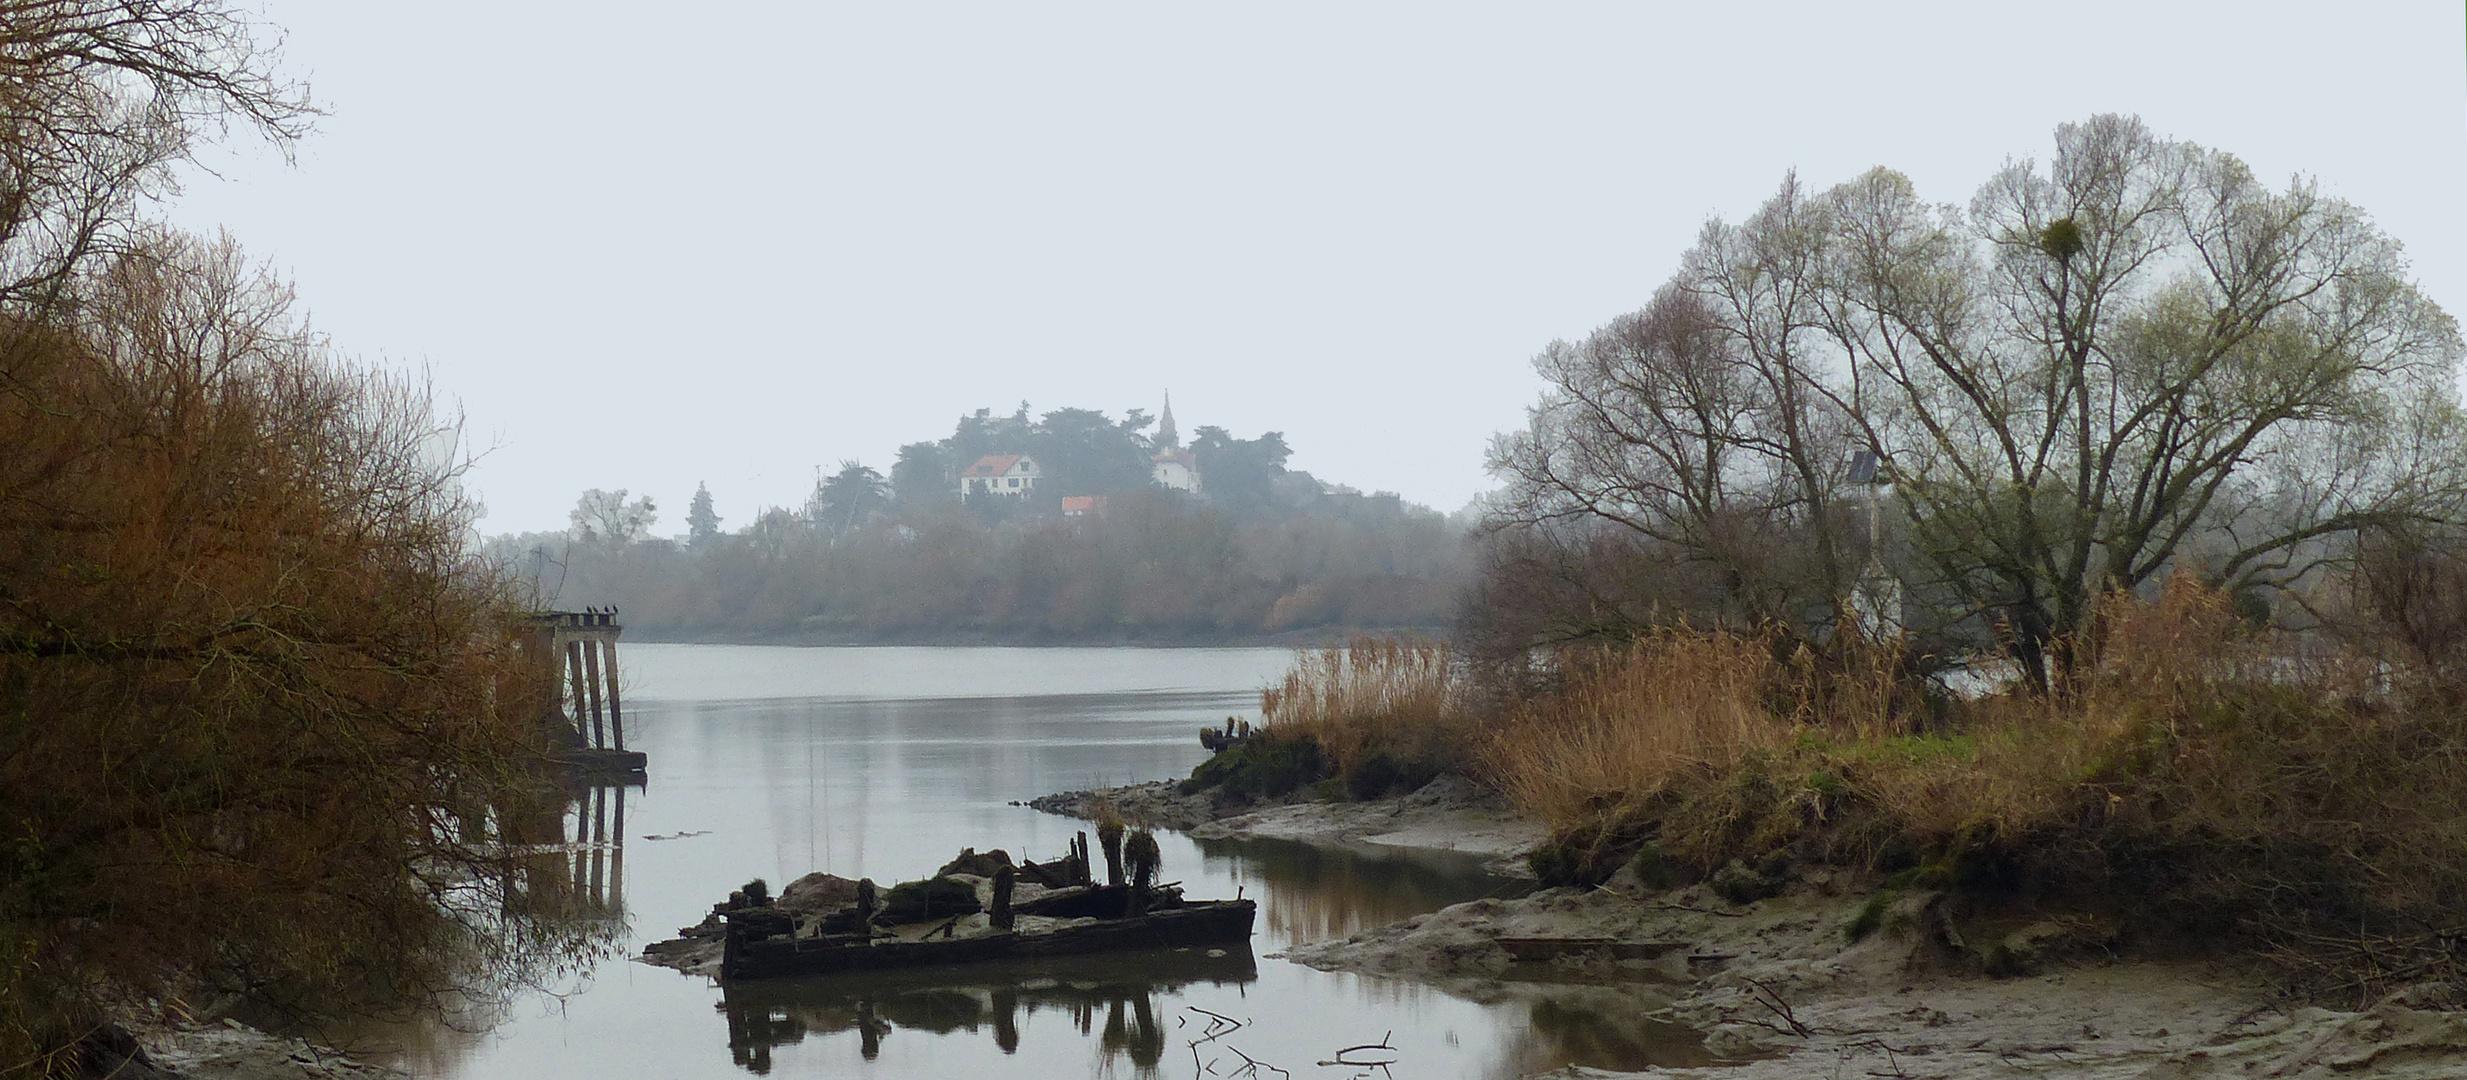 La marée monte, le brouillard se dissipe.....